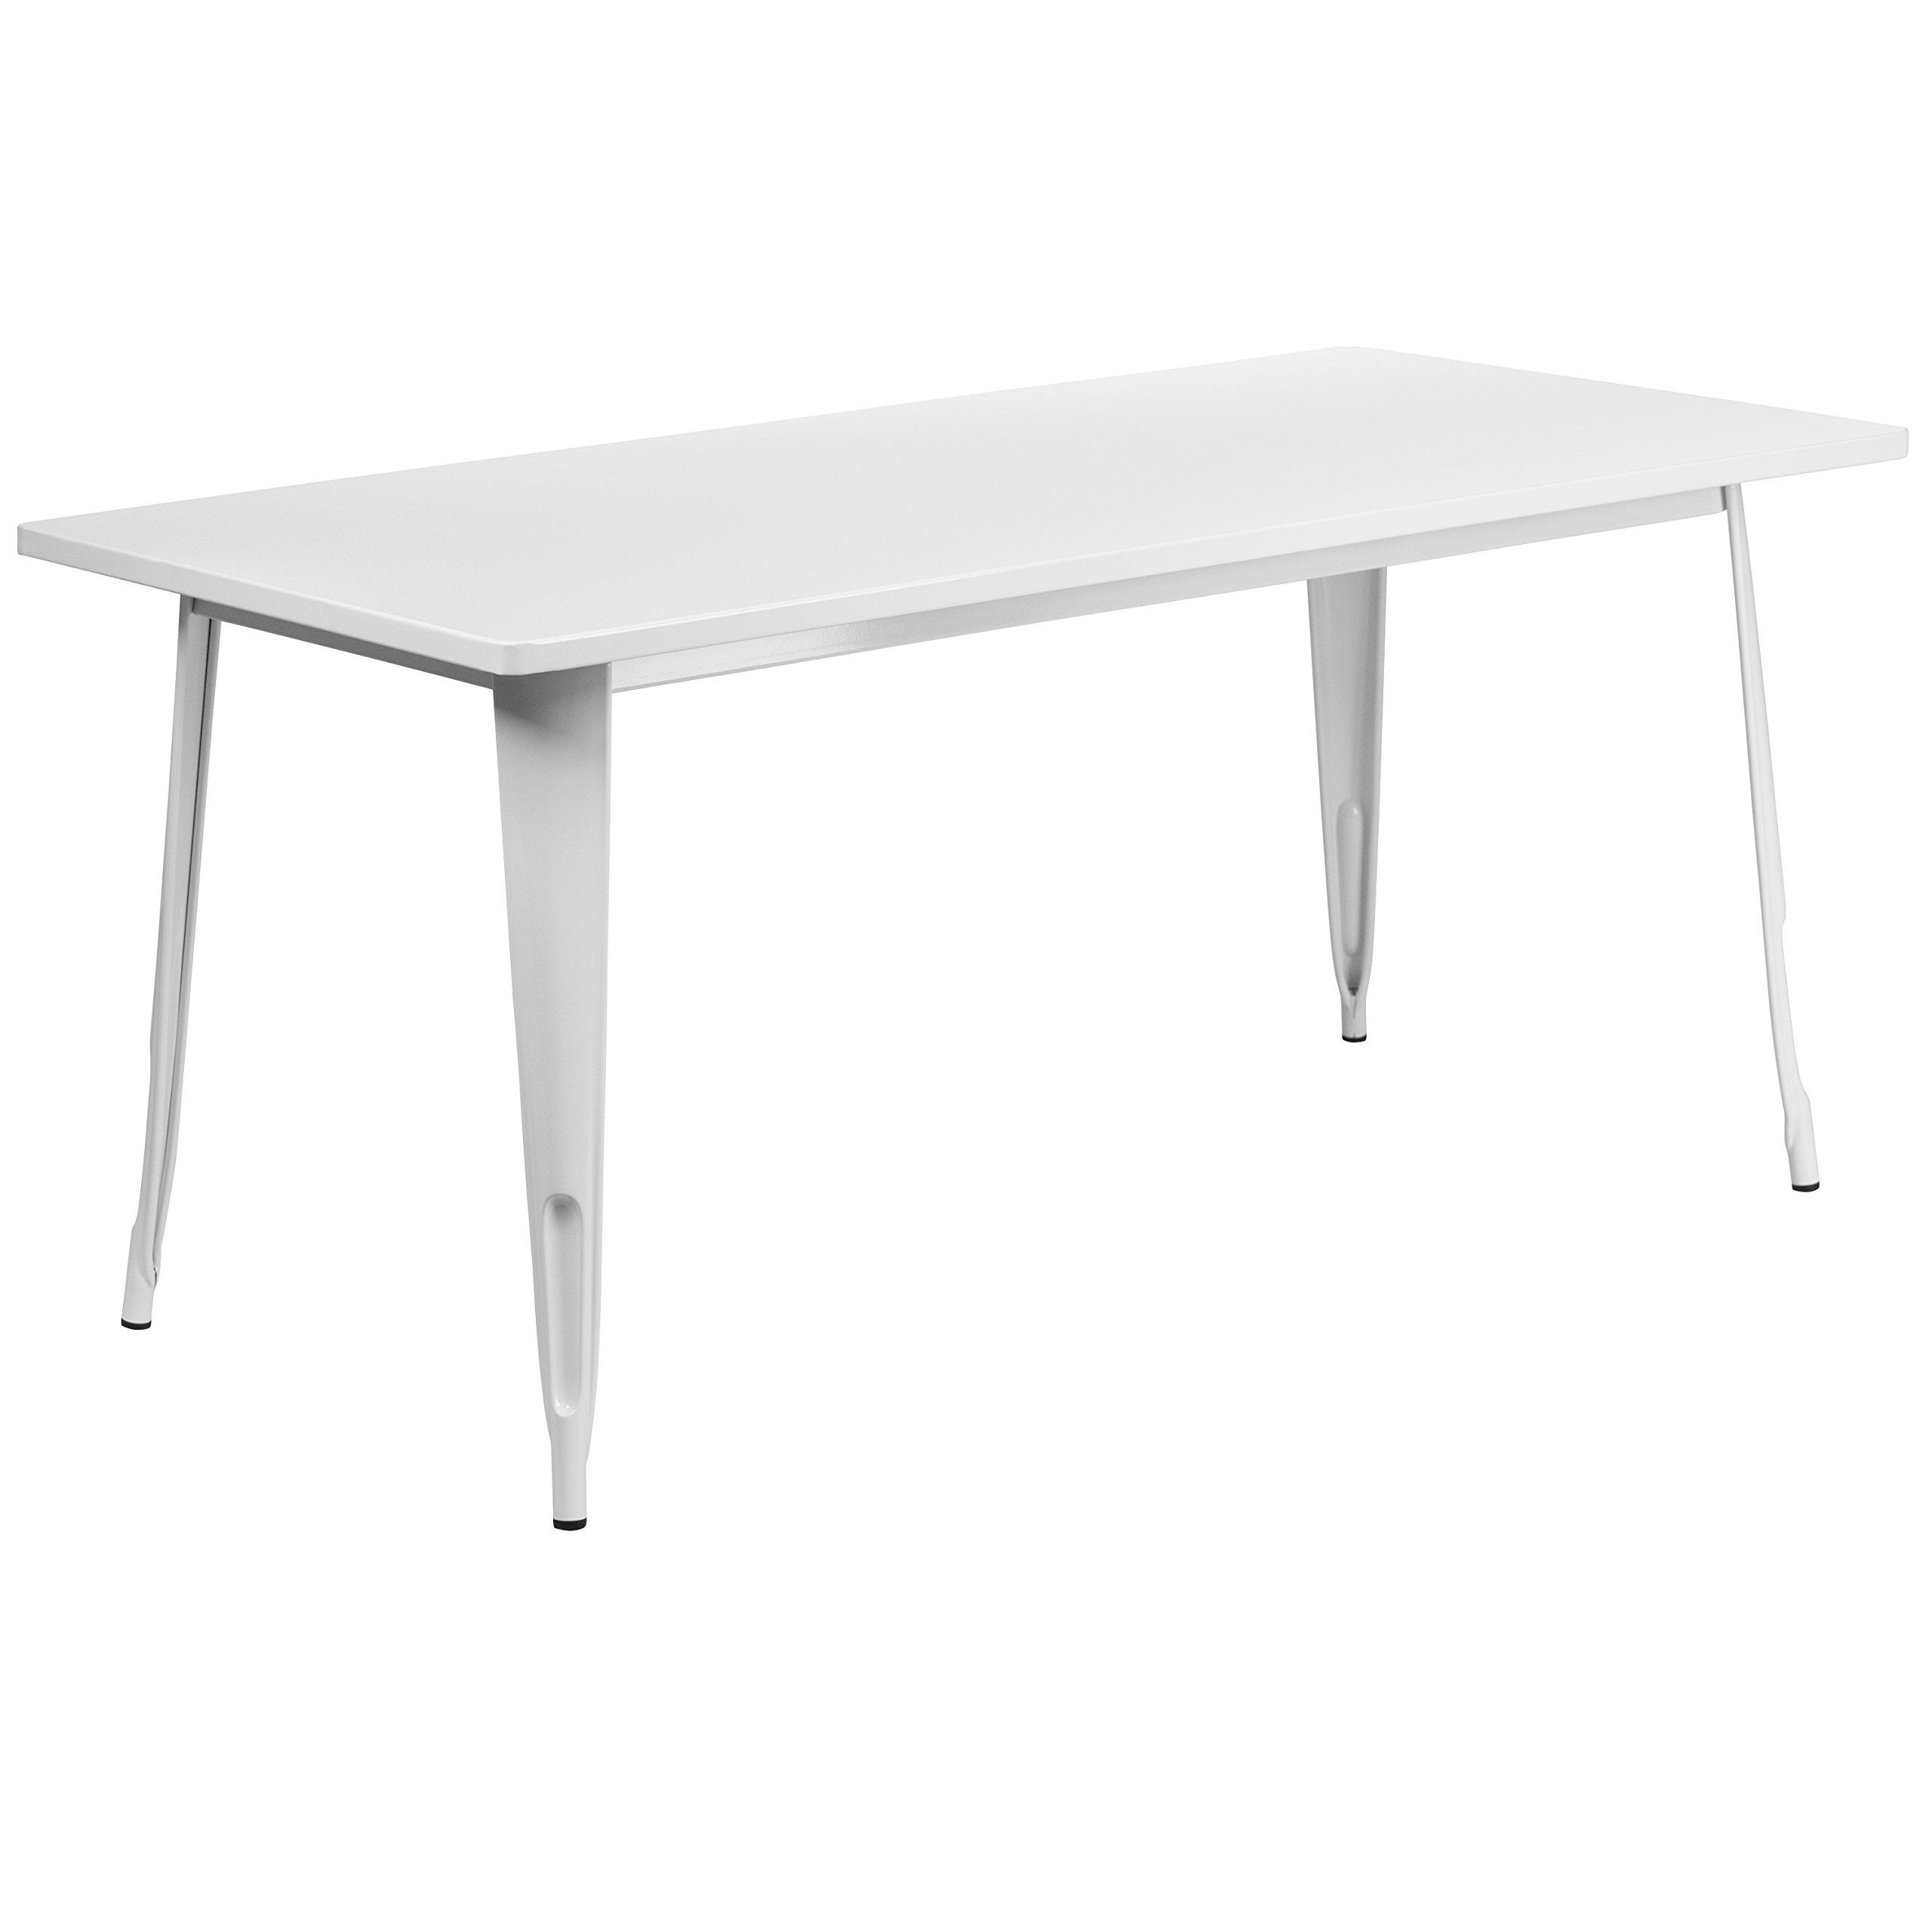 Flash Furniture 31.5'' x 63'' Rectangular White Metal Indoor-Outdoor Table